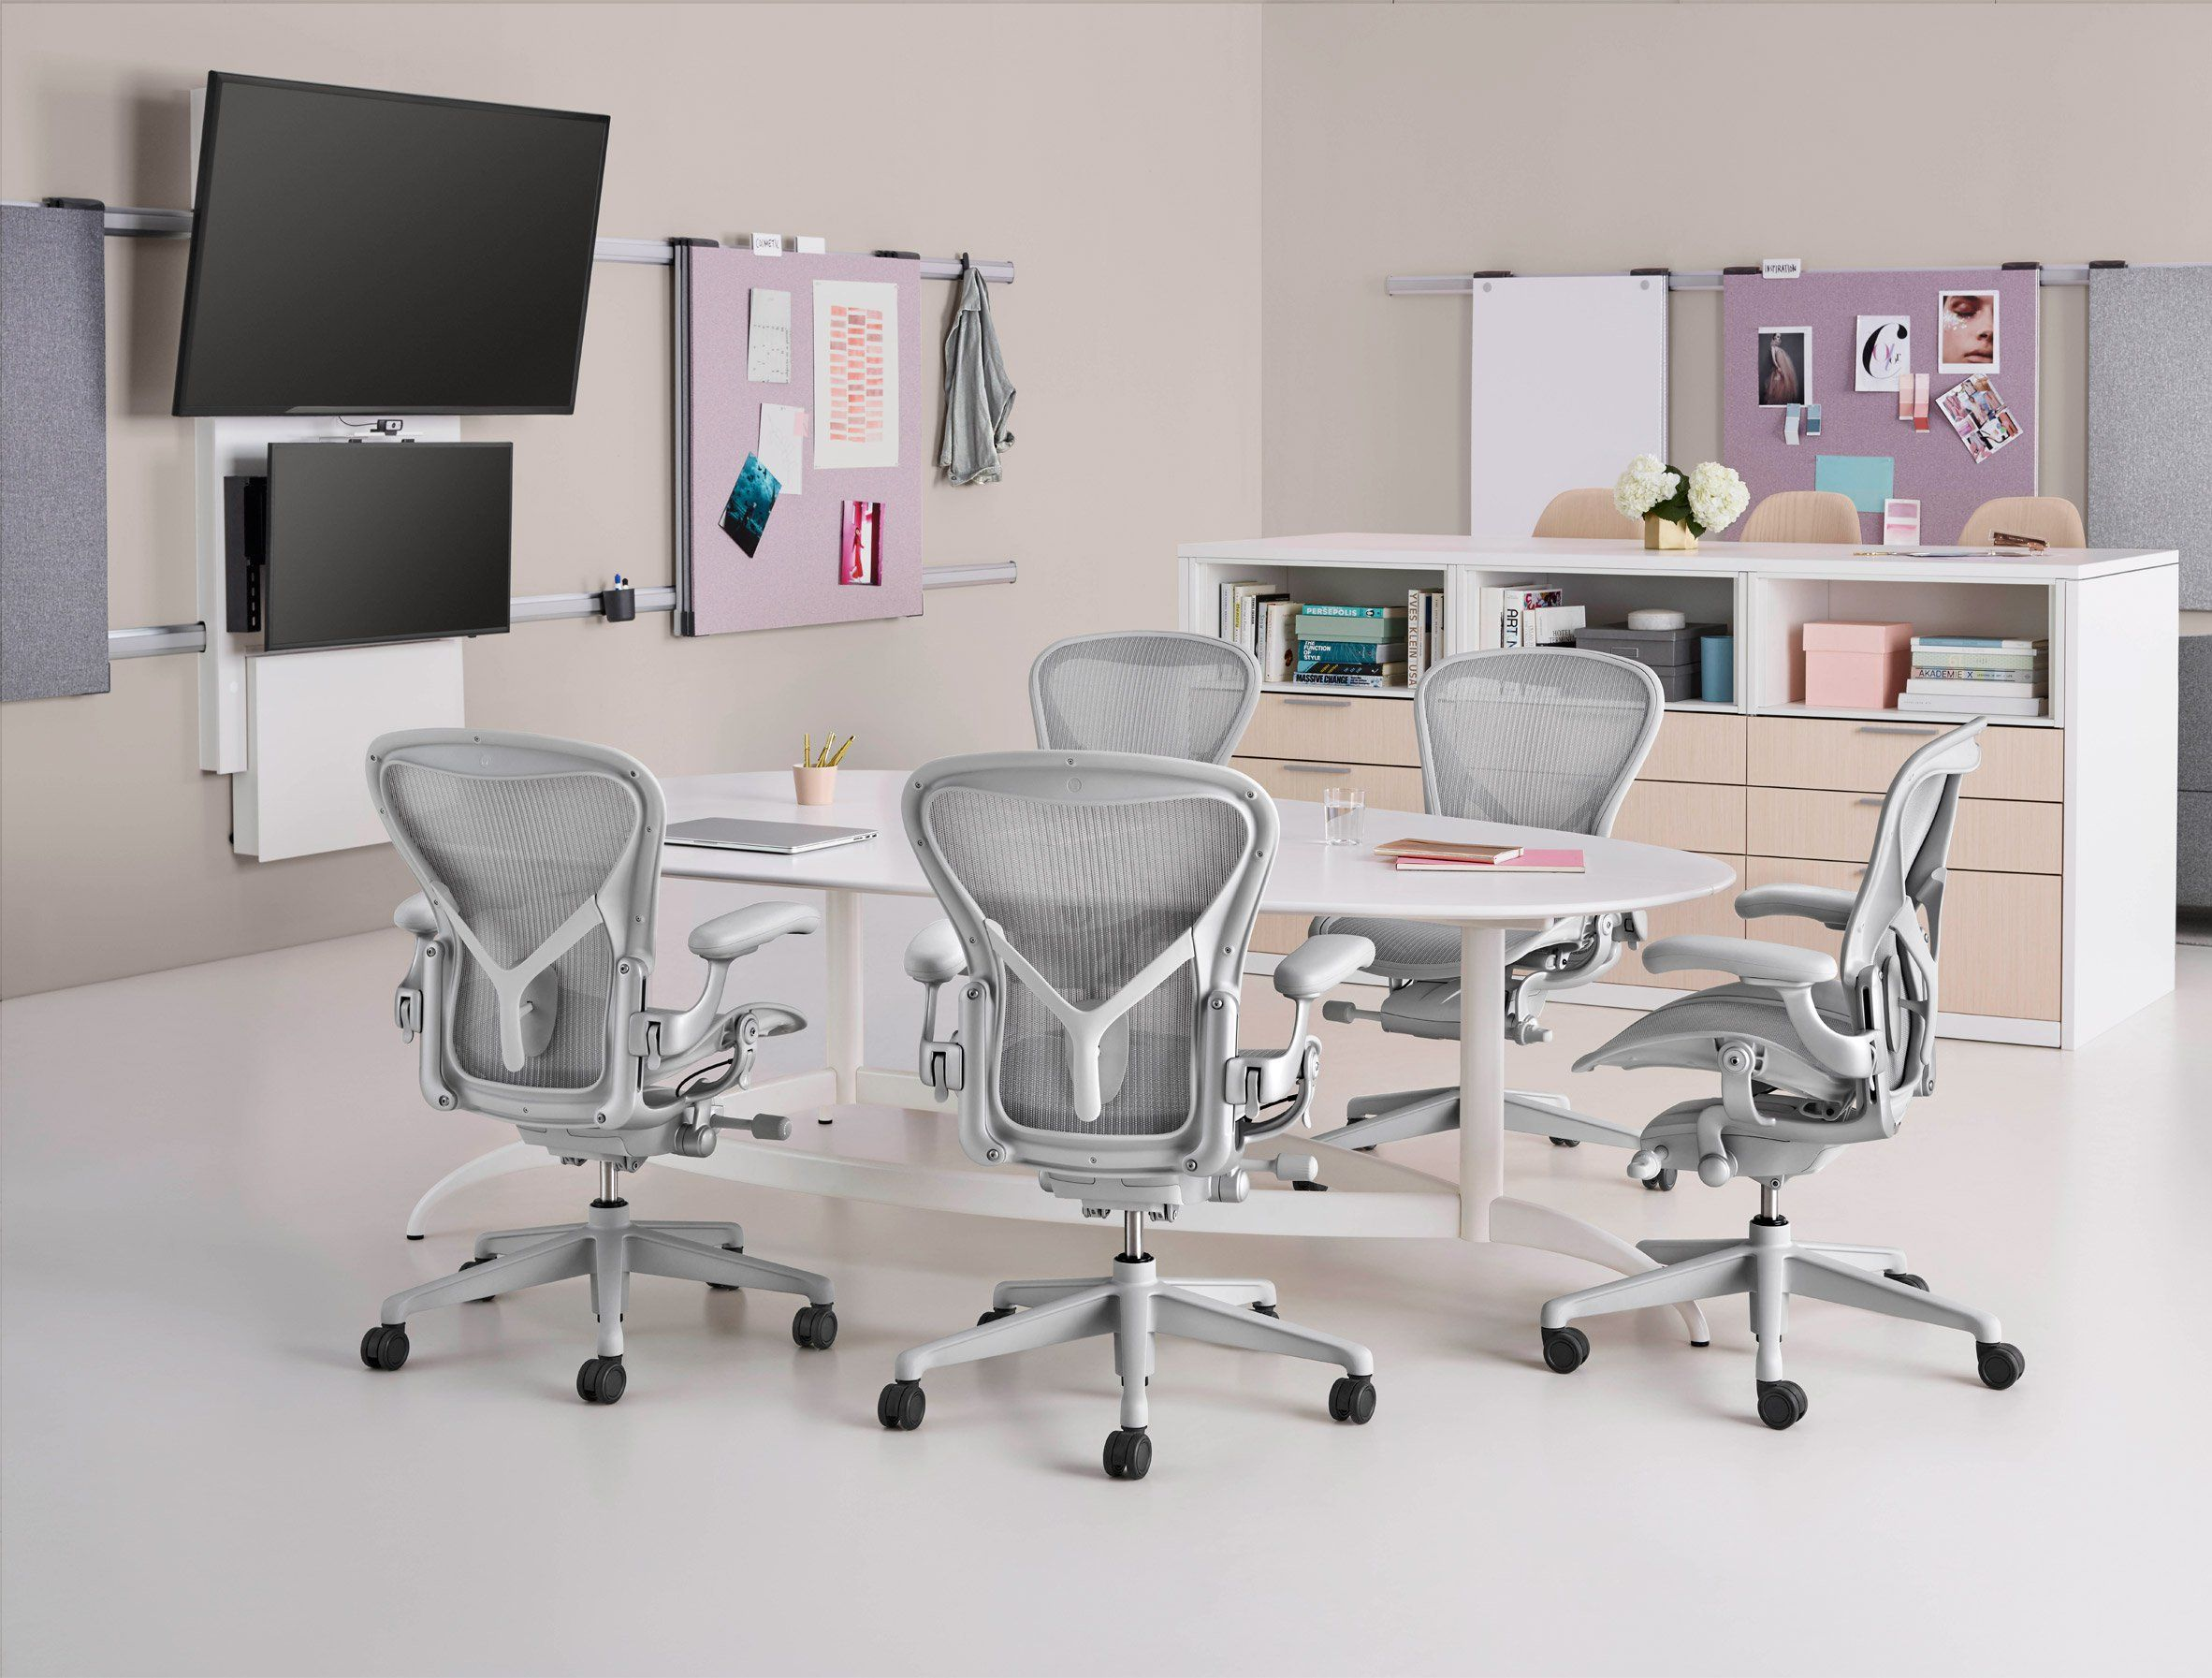 Internationally renowned furniture firm Herman Miller has